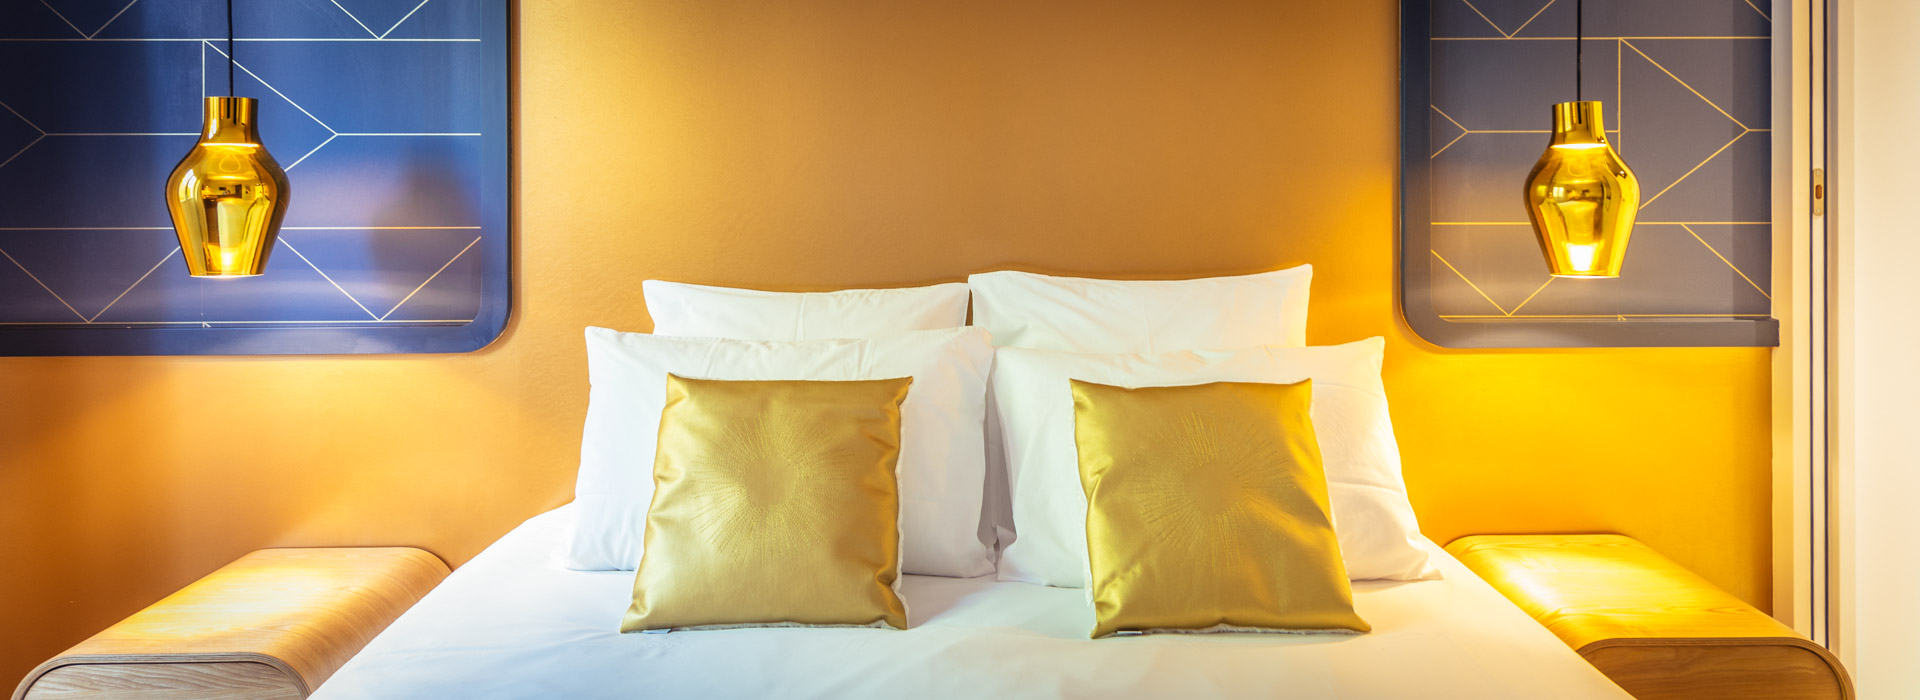 Room Hotel Saumur Pmr